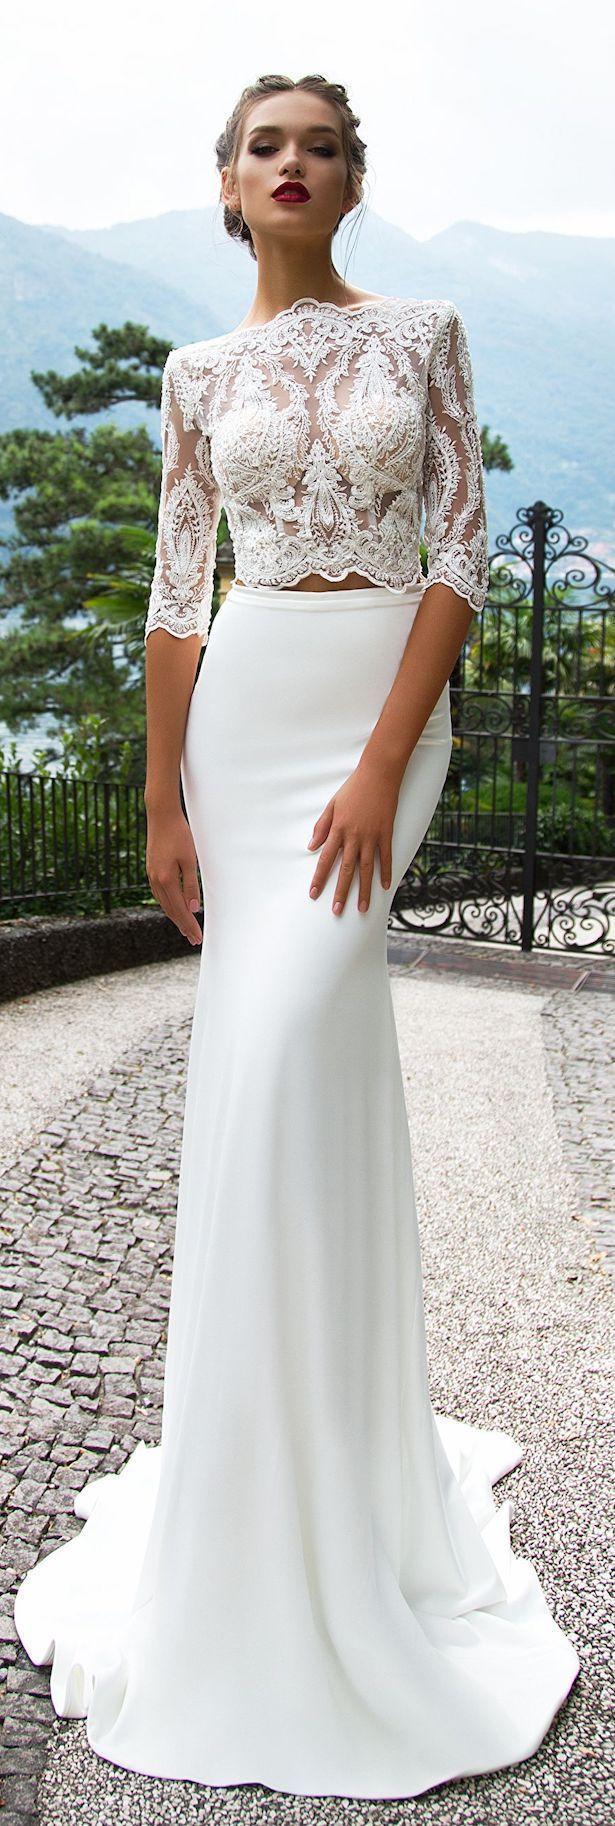 Wedding Dress by Milla Nova White Desire 2017 Bridal Collection - Merill